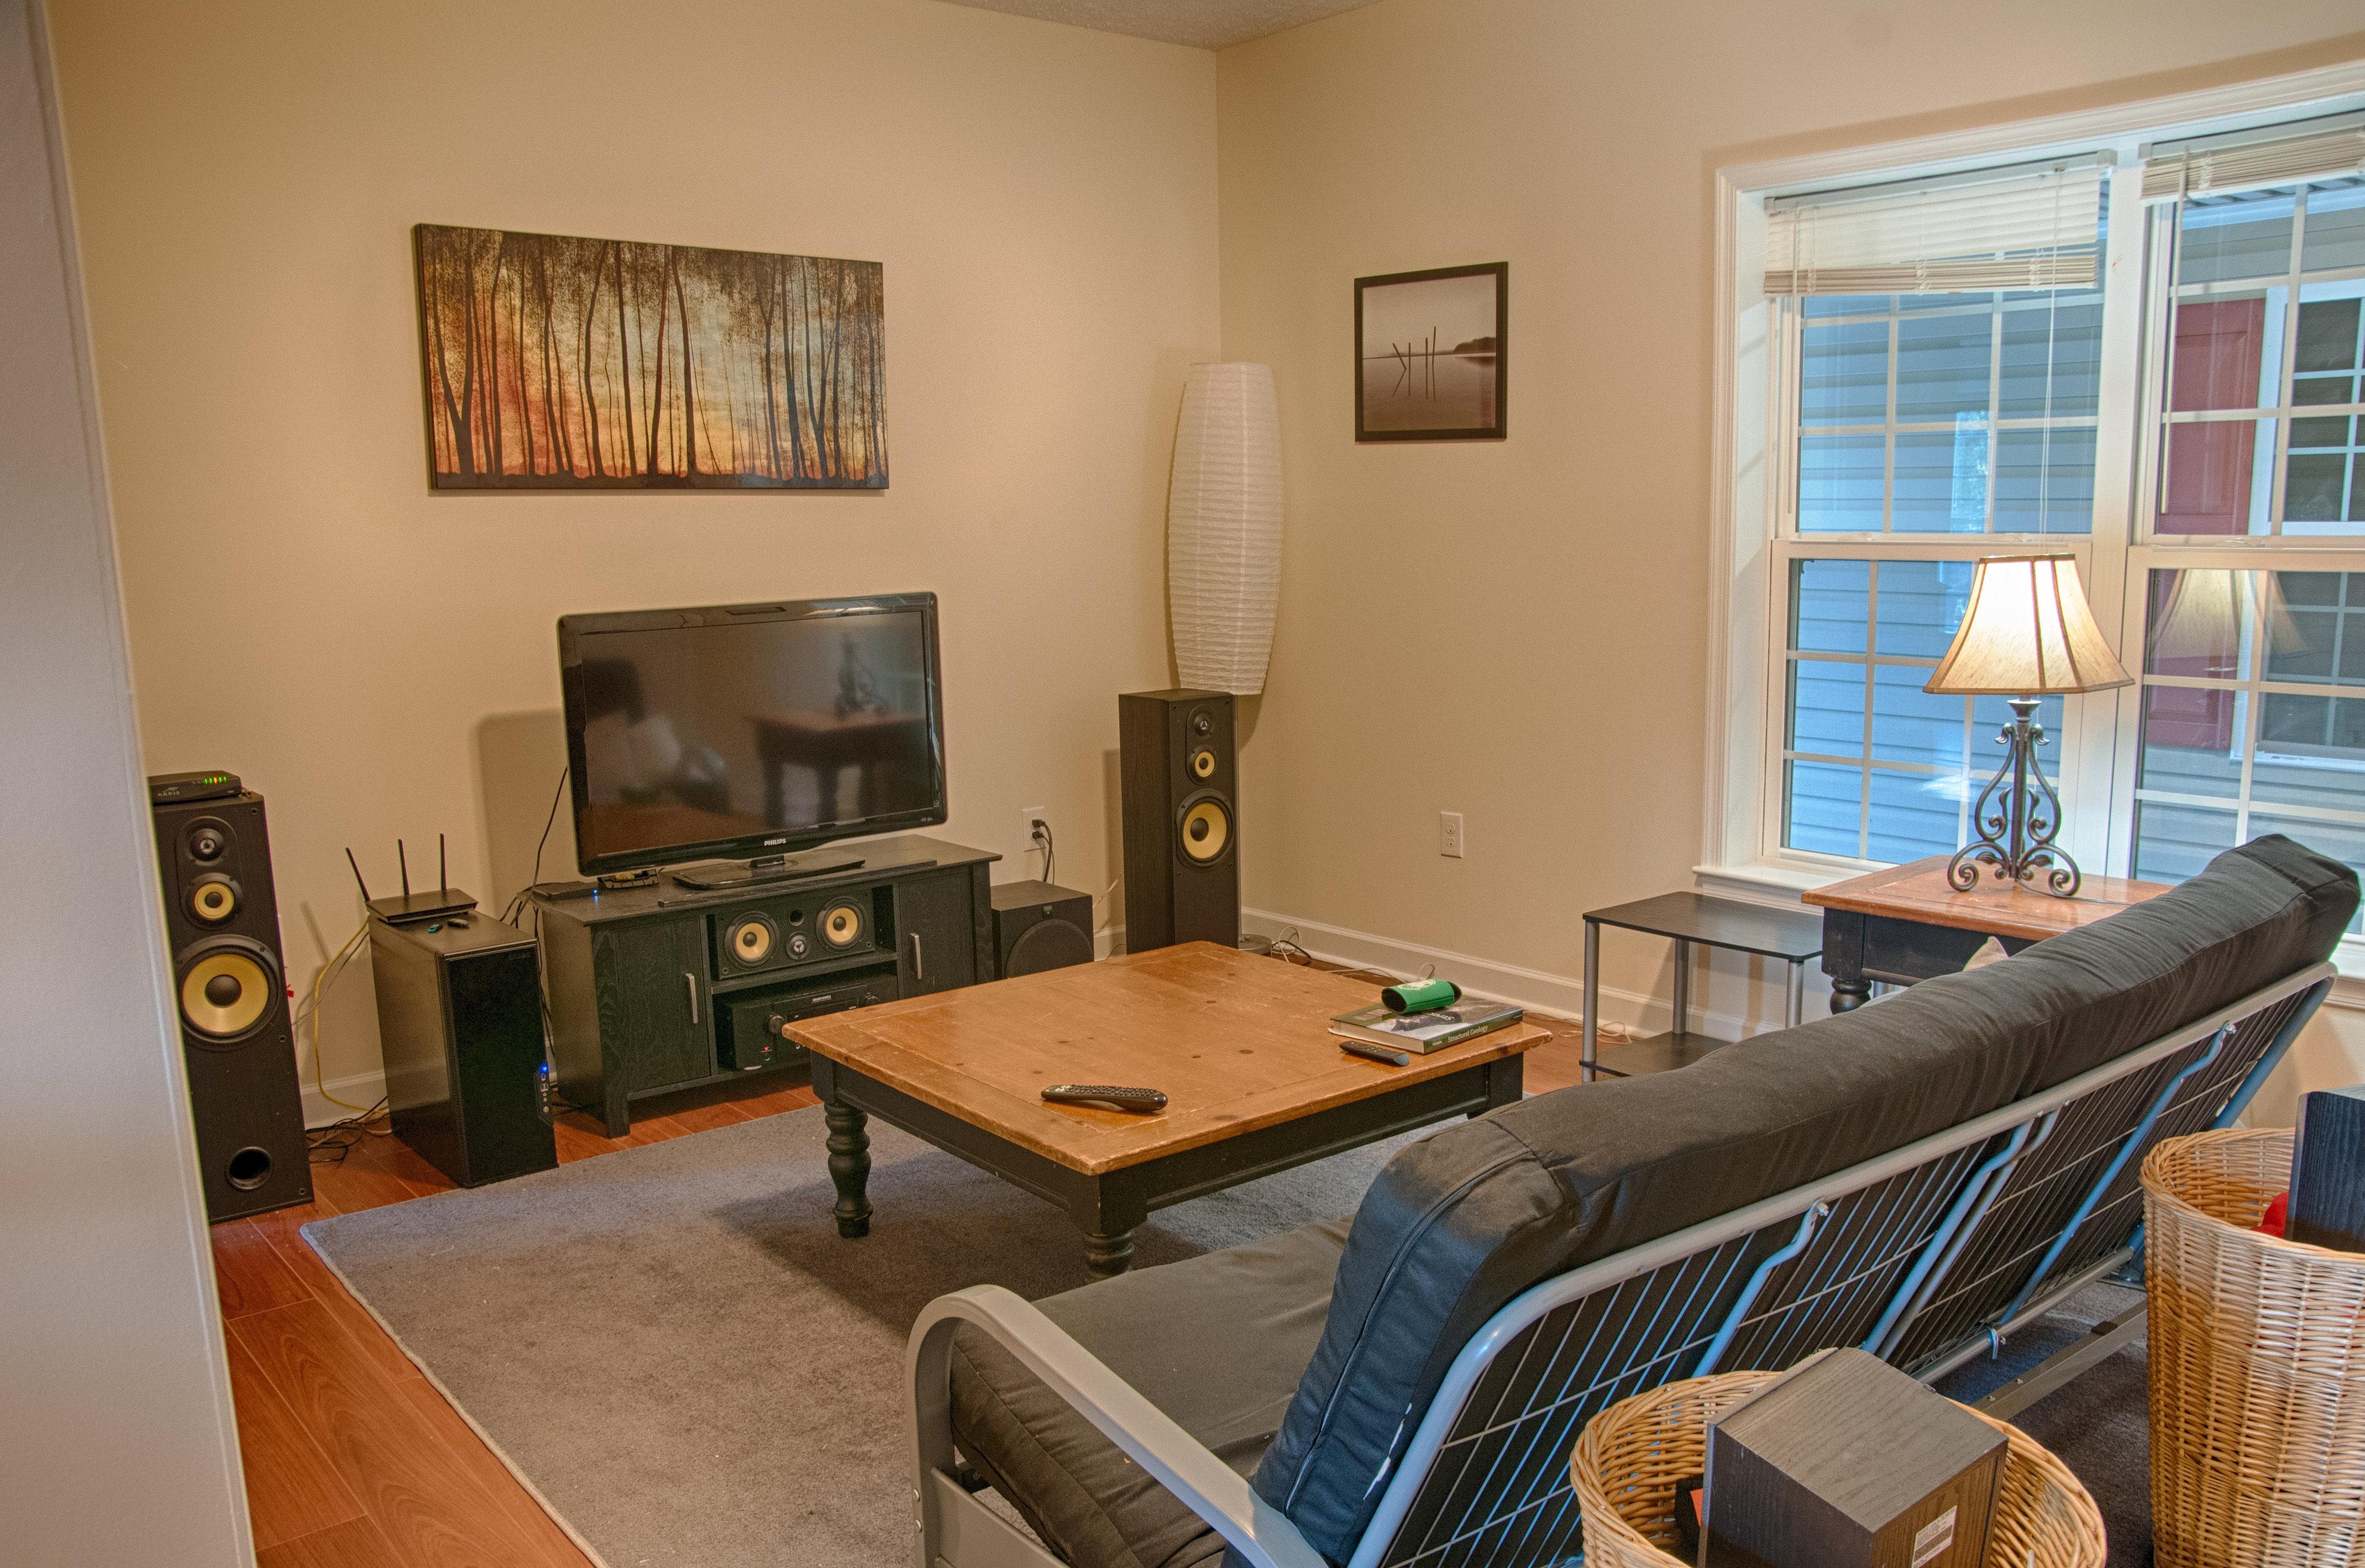 King Street Rentals Student Apartments Appalachian State University